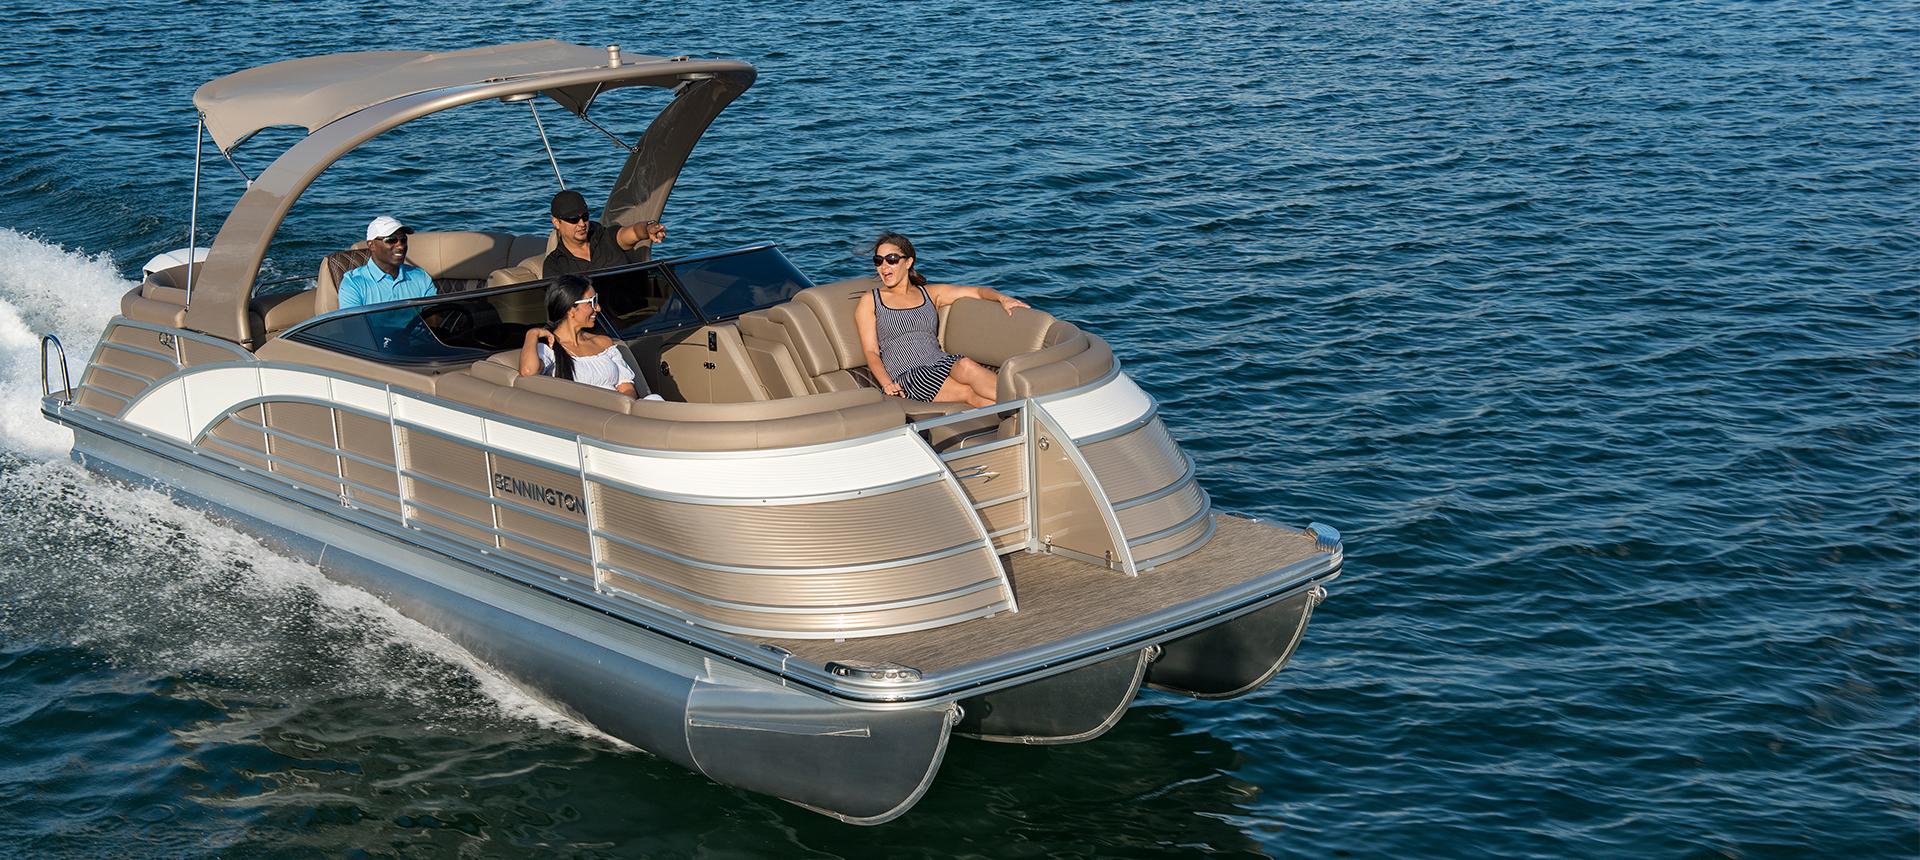 Pic of Q model boat